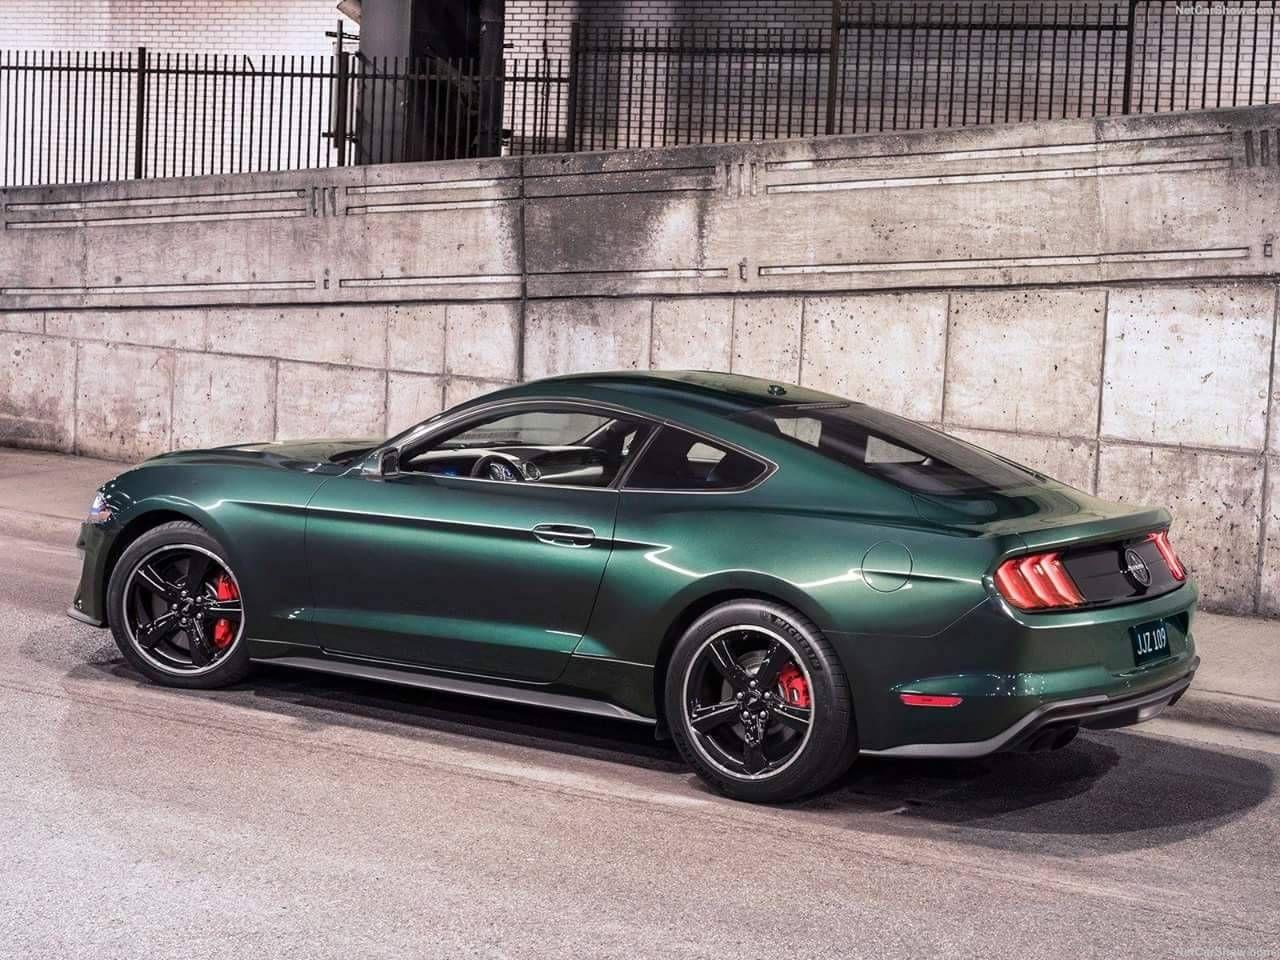 2019 Ford Mustang Bullitt Mustang Bullitt Ford Mustang Bullitt New Ford Mustang